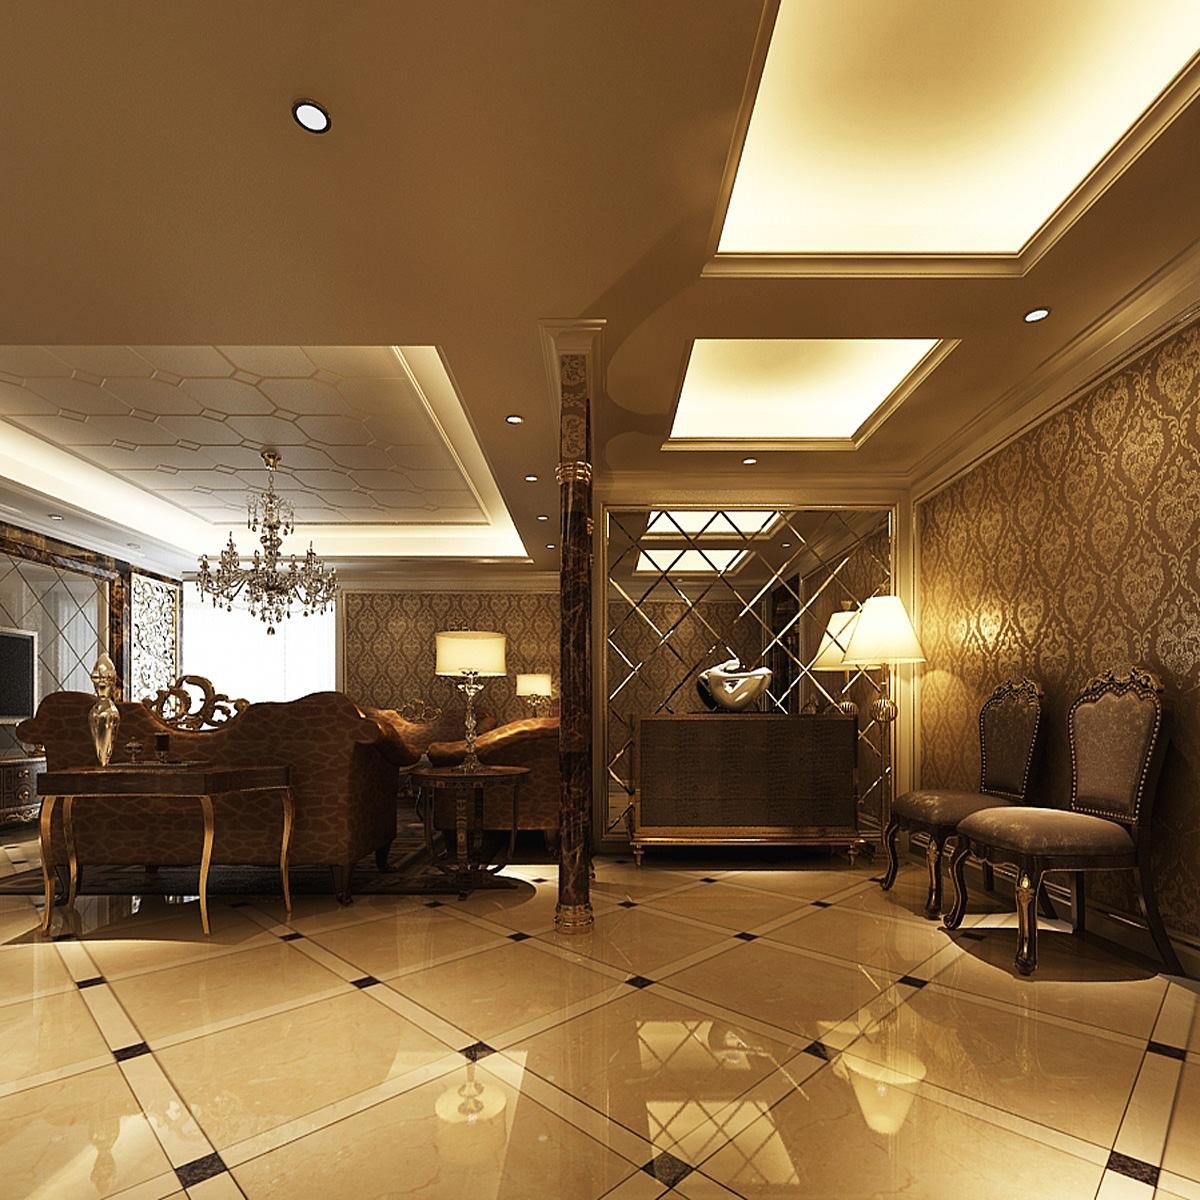 Golden interior photoreal flat 3d model max for Flat interior